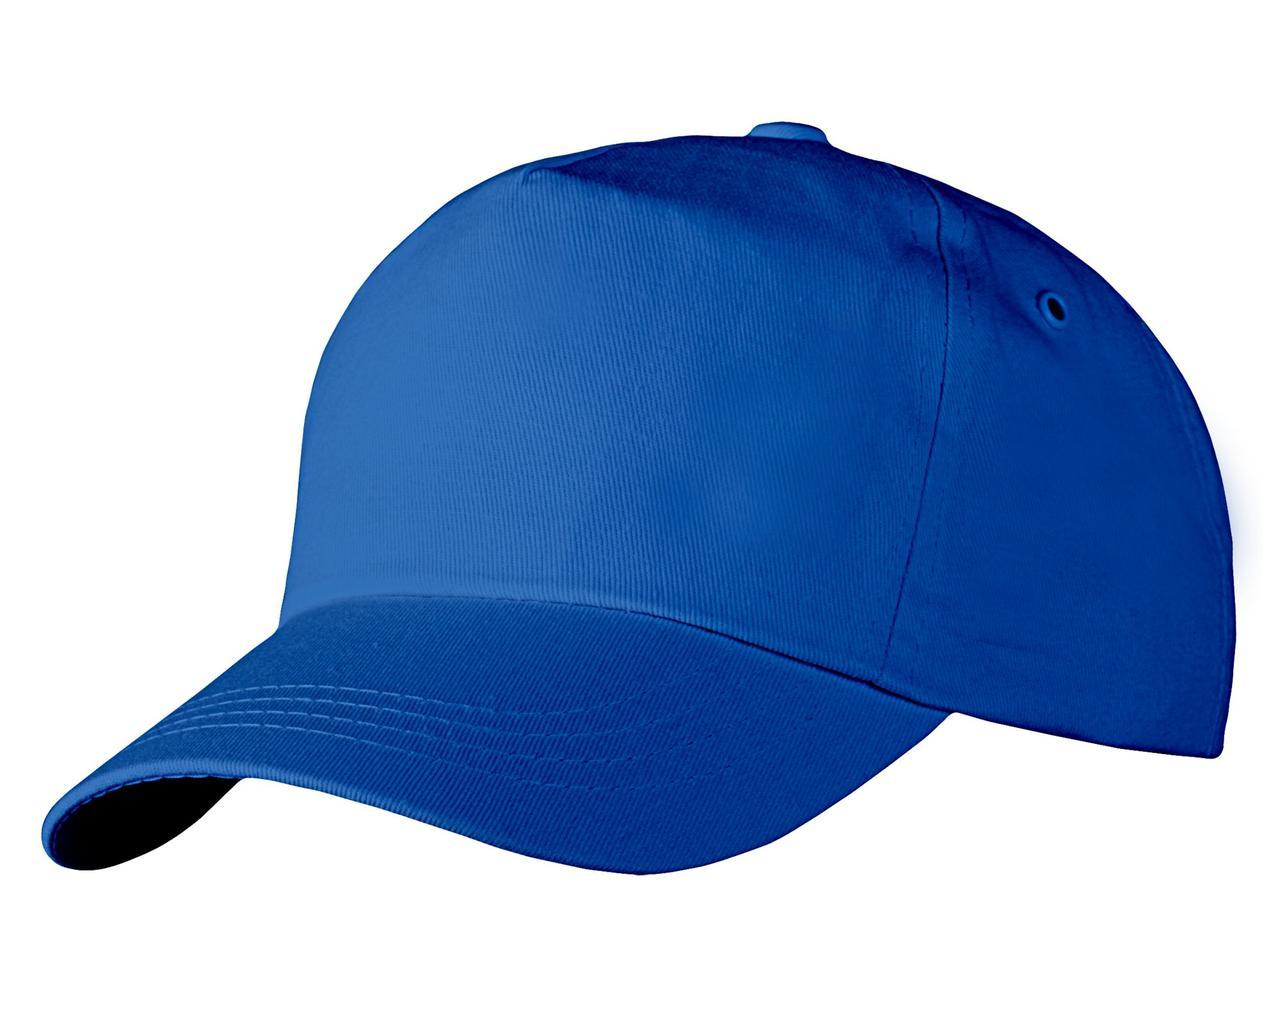 Бейсболка Unit Promo, синяя (артикул 1846.40)